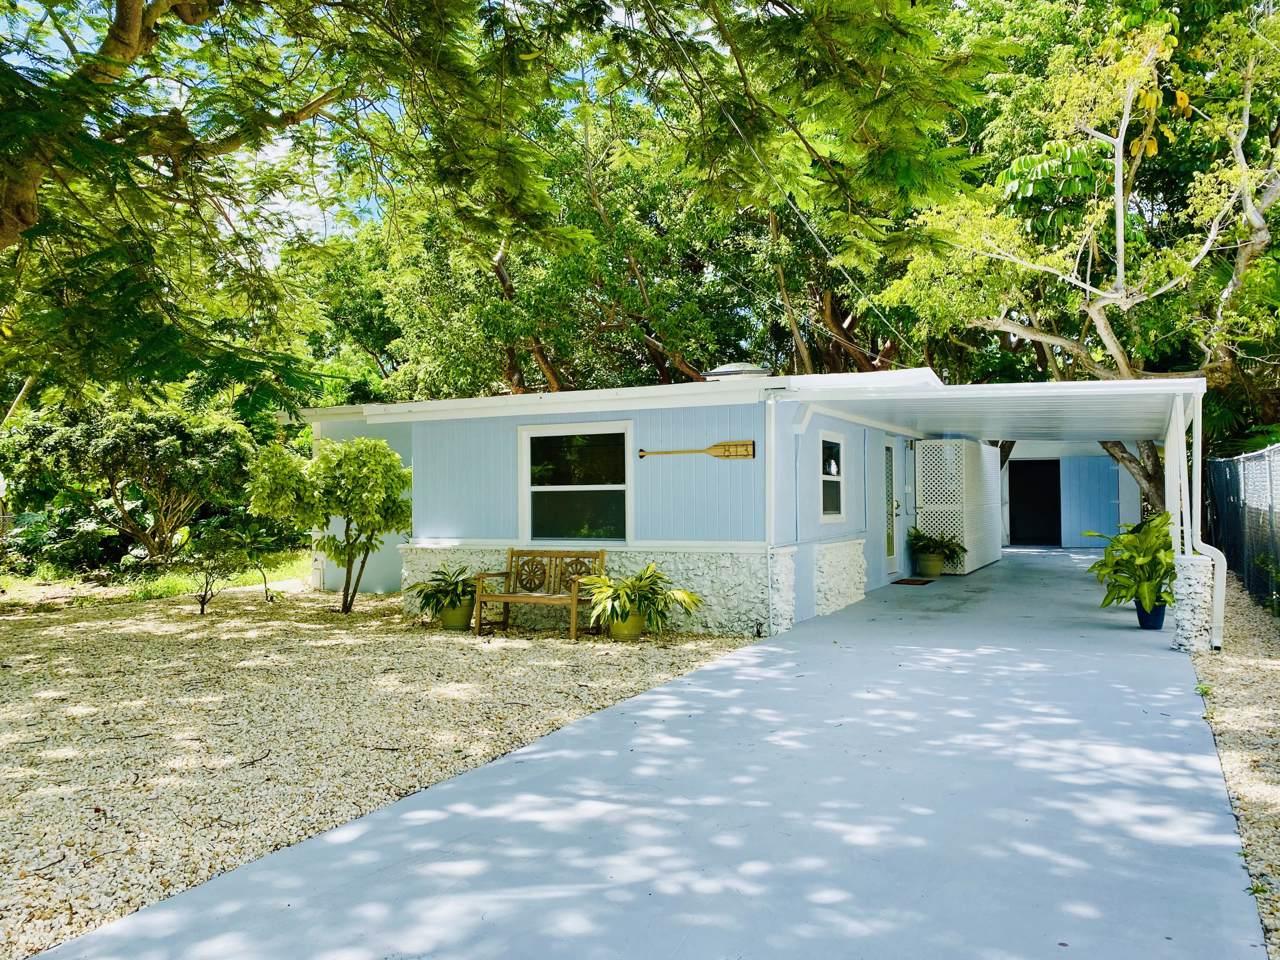 813 La Paloma Road - Photo 1